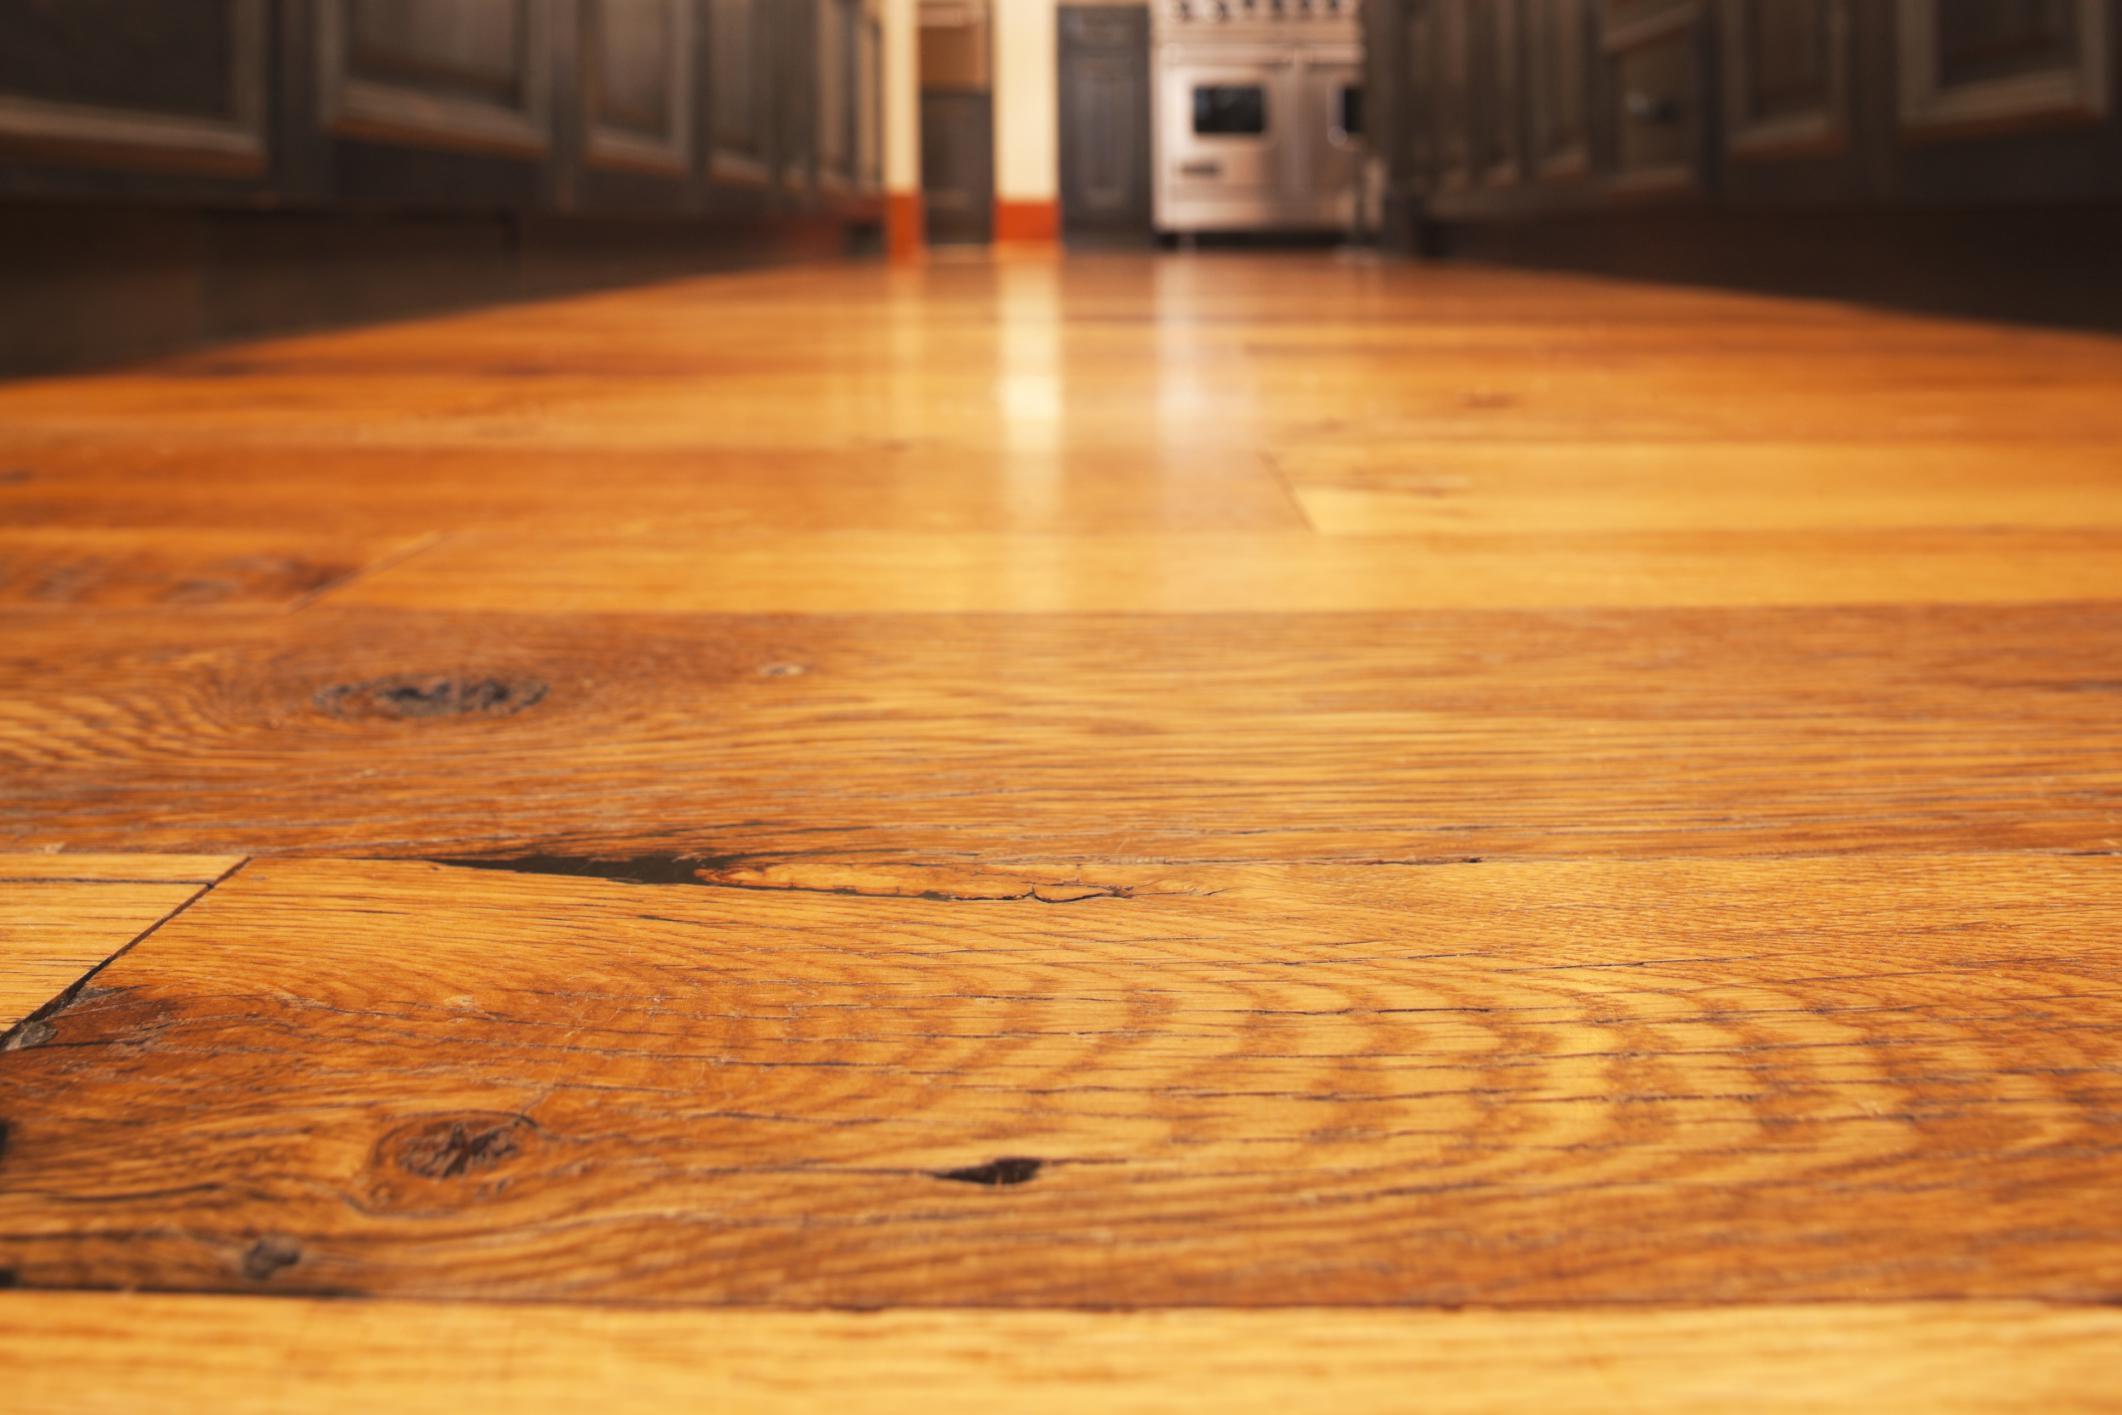 hardwood floor gouge repair of how to sand hardwood floors inside 185126347 56a49f3d5f9b58b7d0d7e154